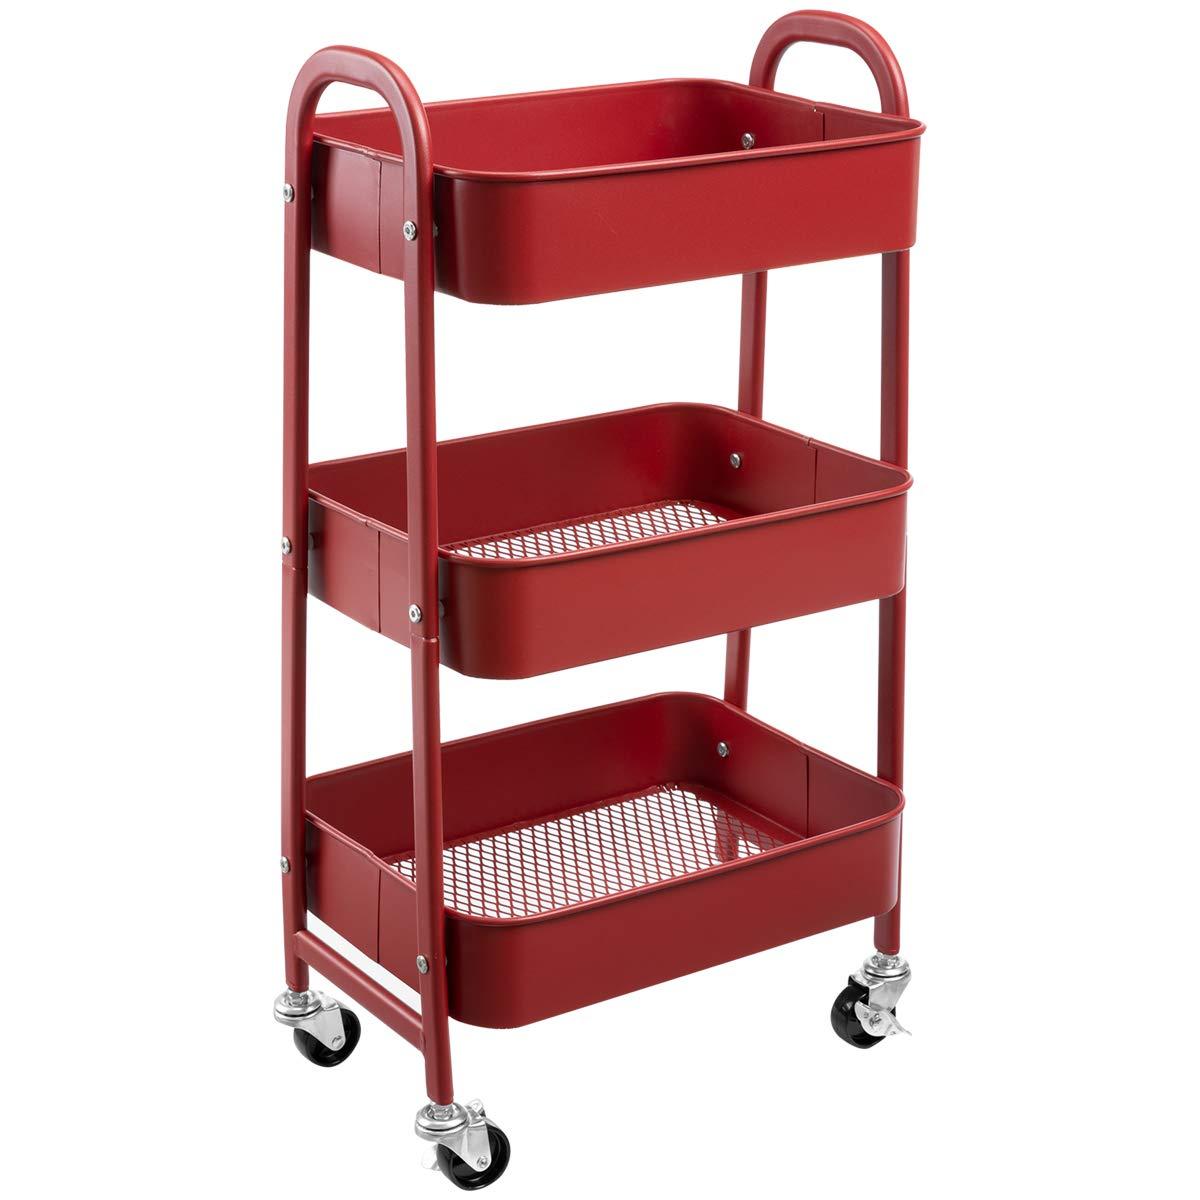 AGTEK Makeup Cart, Movable Rolling Organizer Cart, 3 Tier Metal Utility Cart, Brick Red